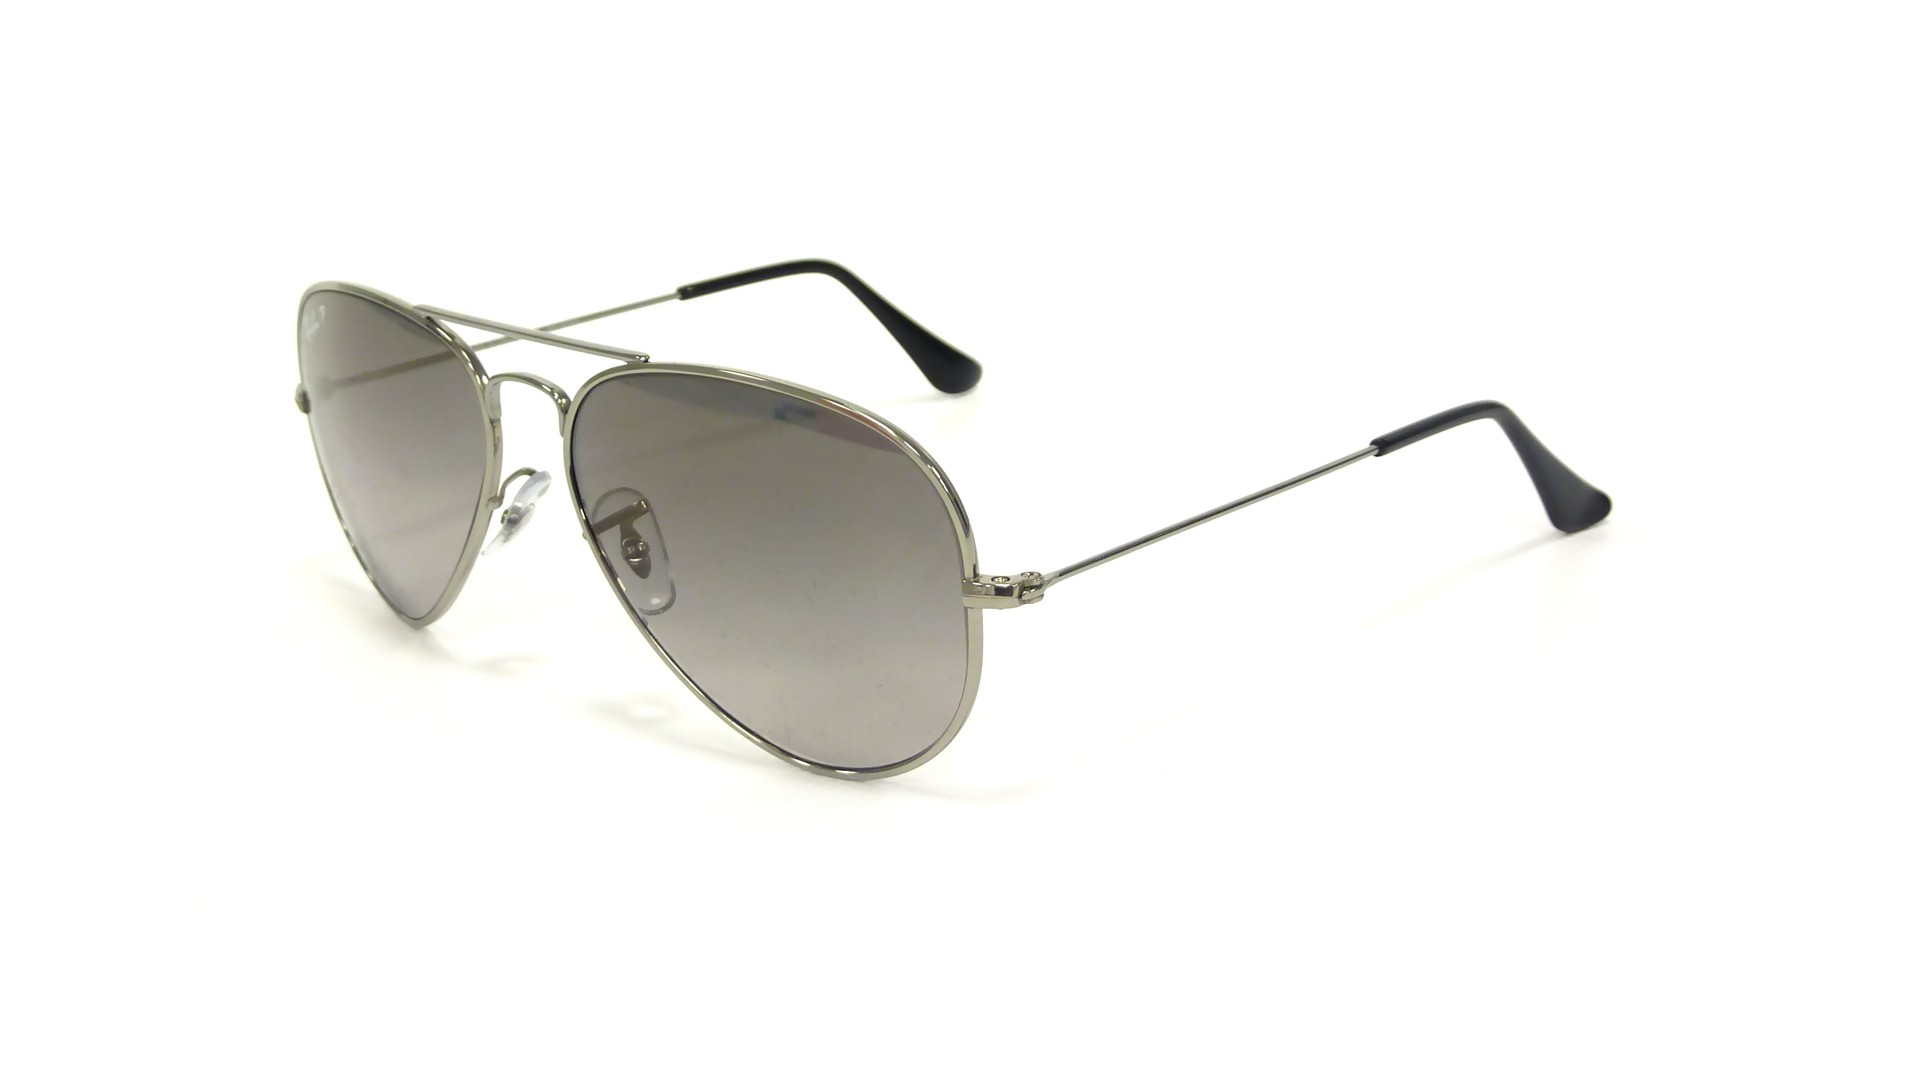 ray ban 8041 aviator titanium eyeglass heritage malta rh heritagemalta org